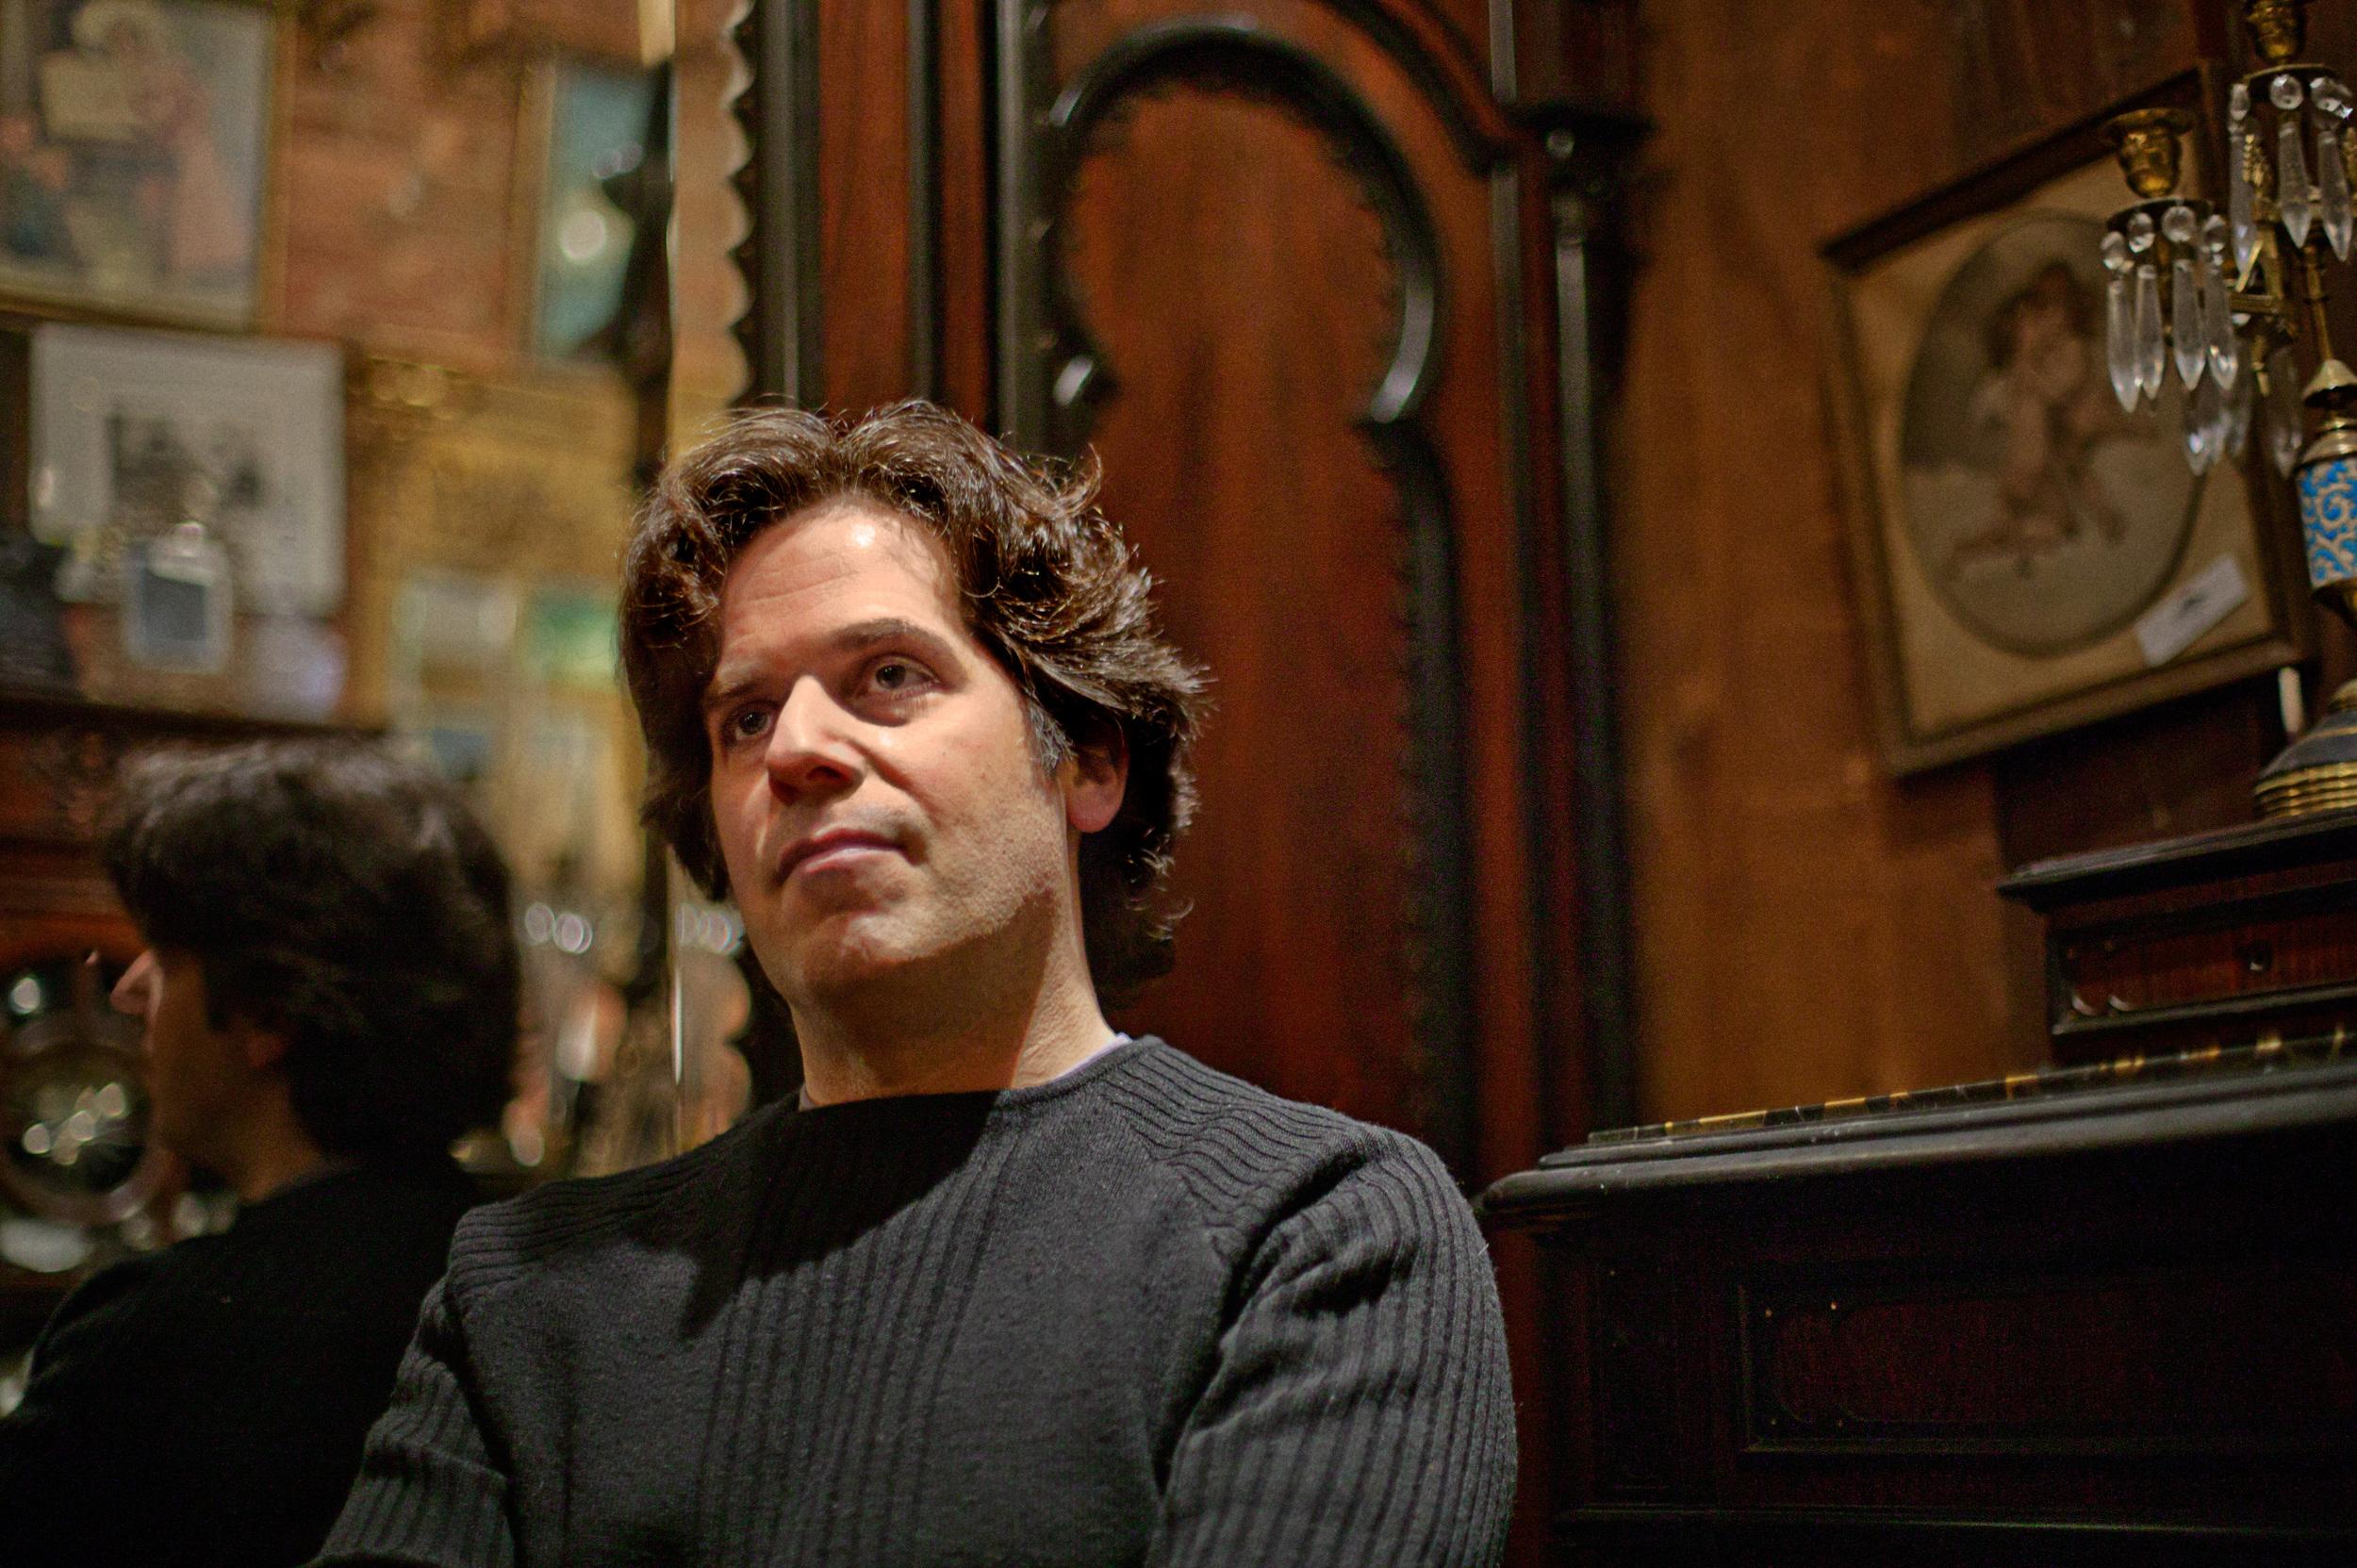 Jonathan Lethem, Author